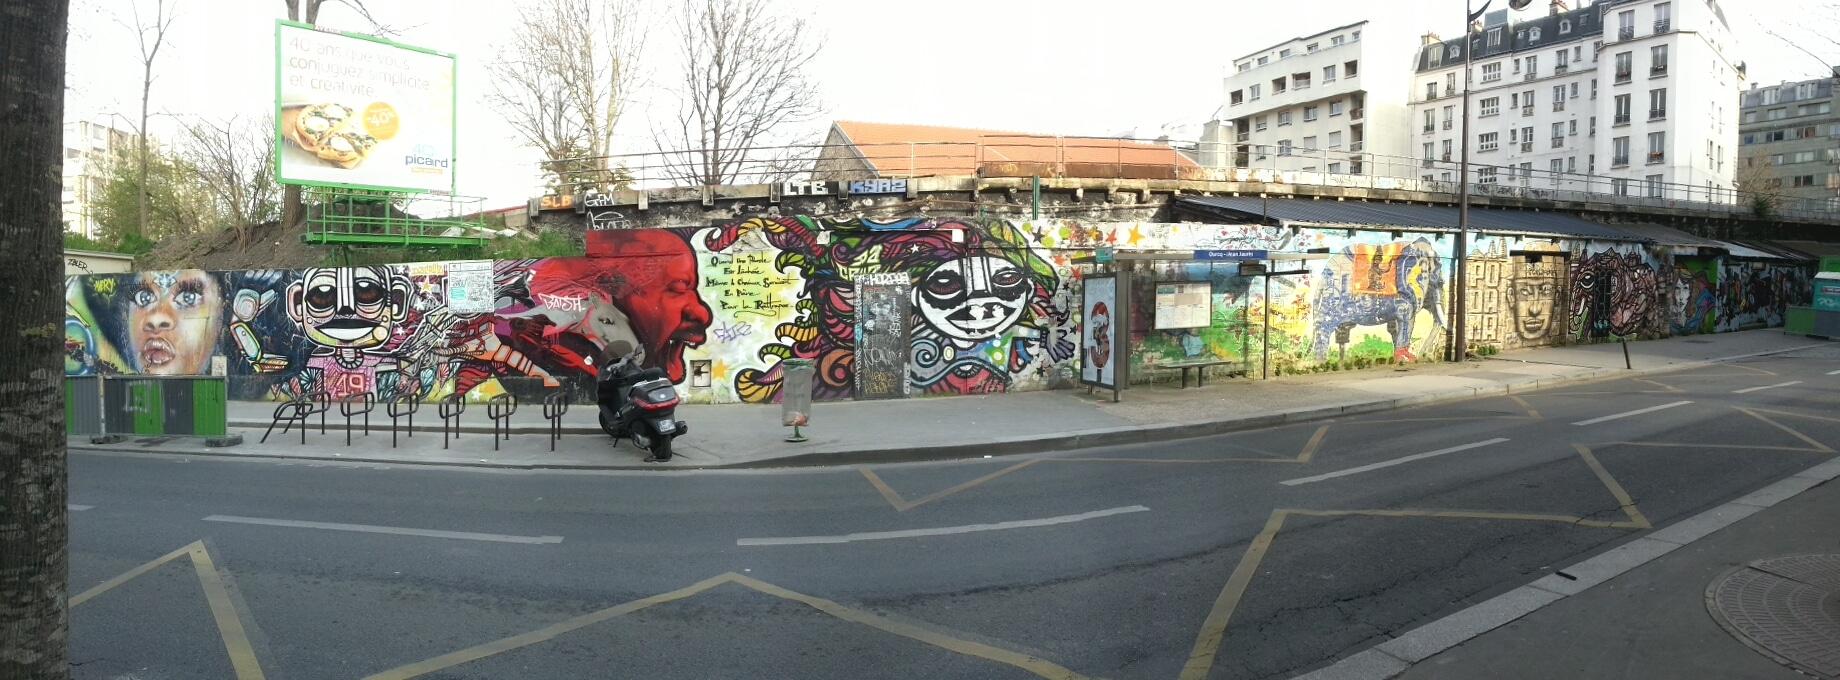 PANO_20140315_170806-Street-art-62